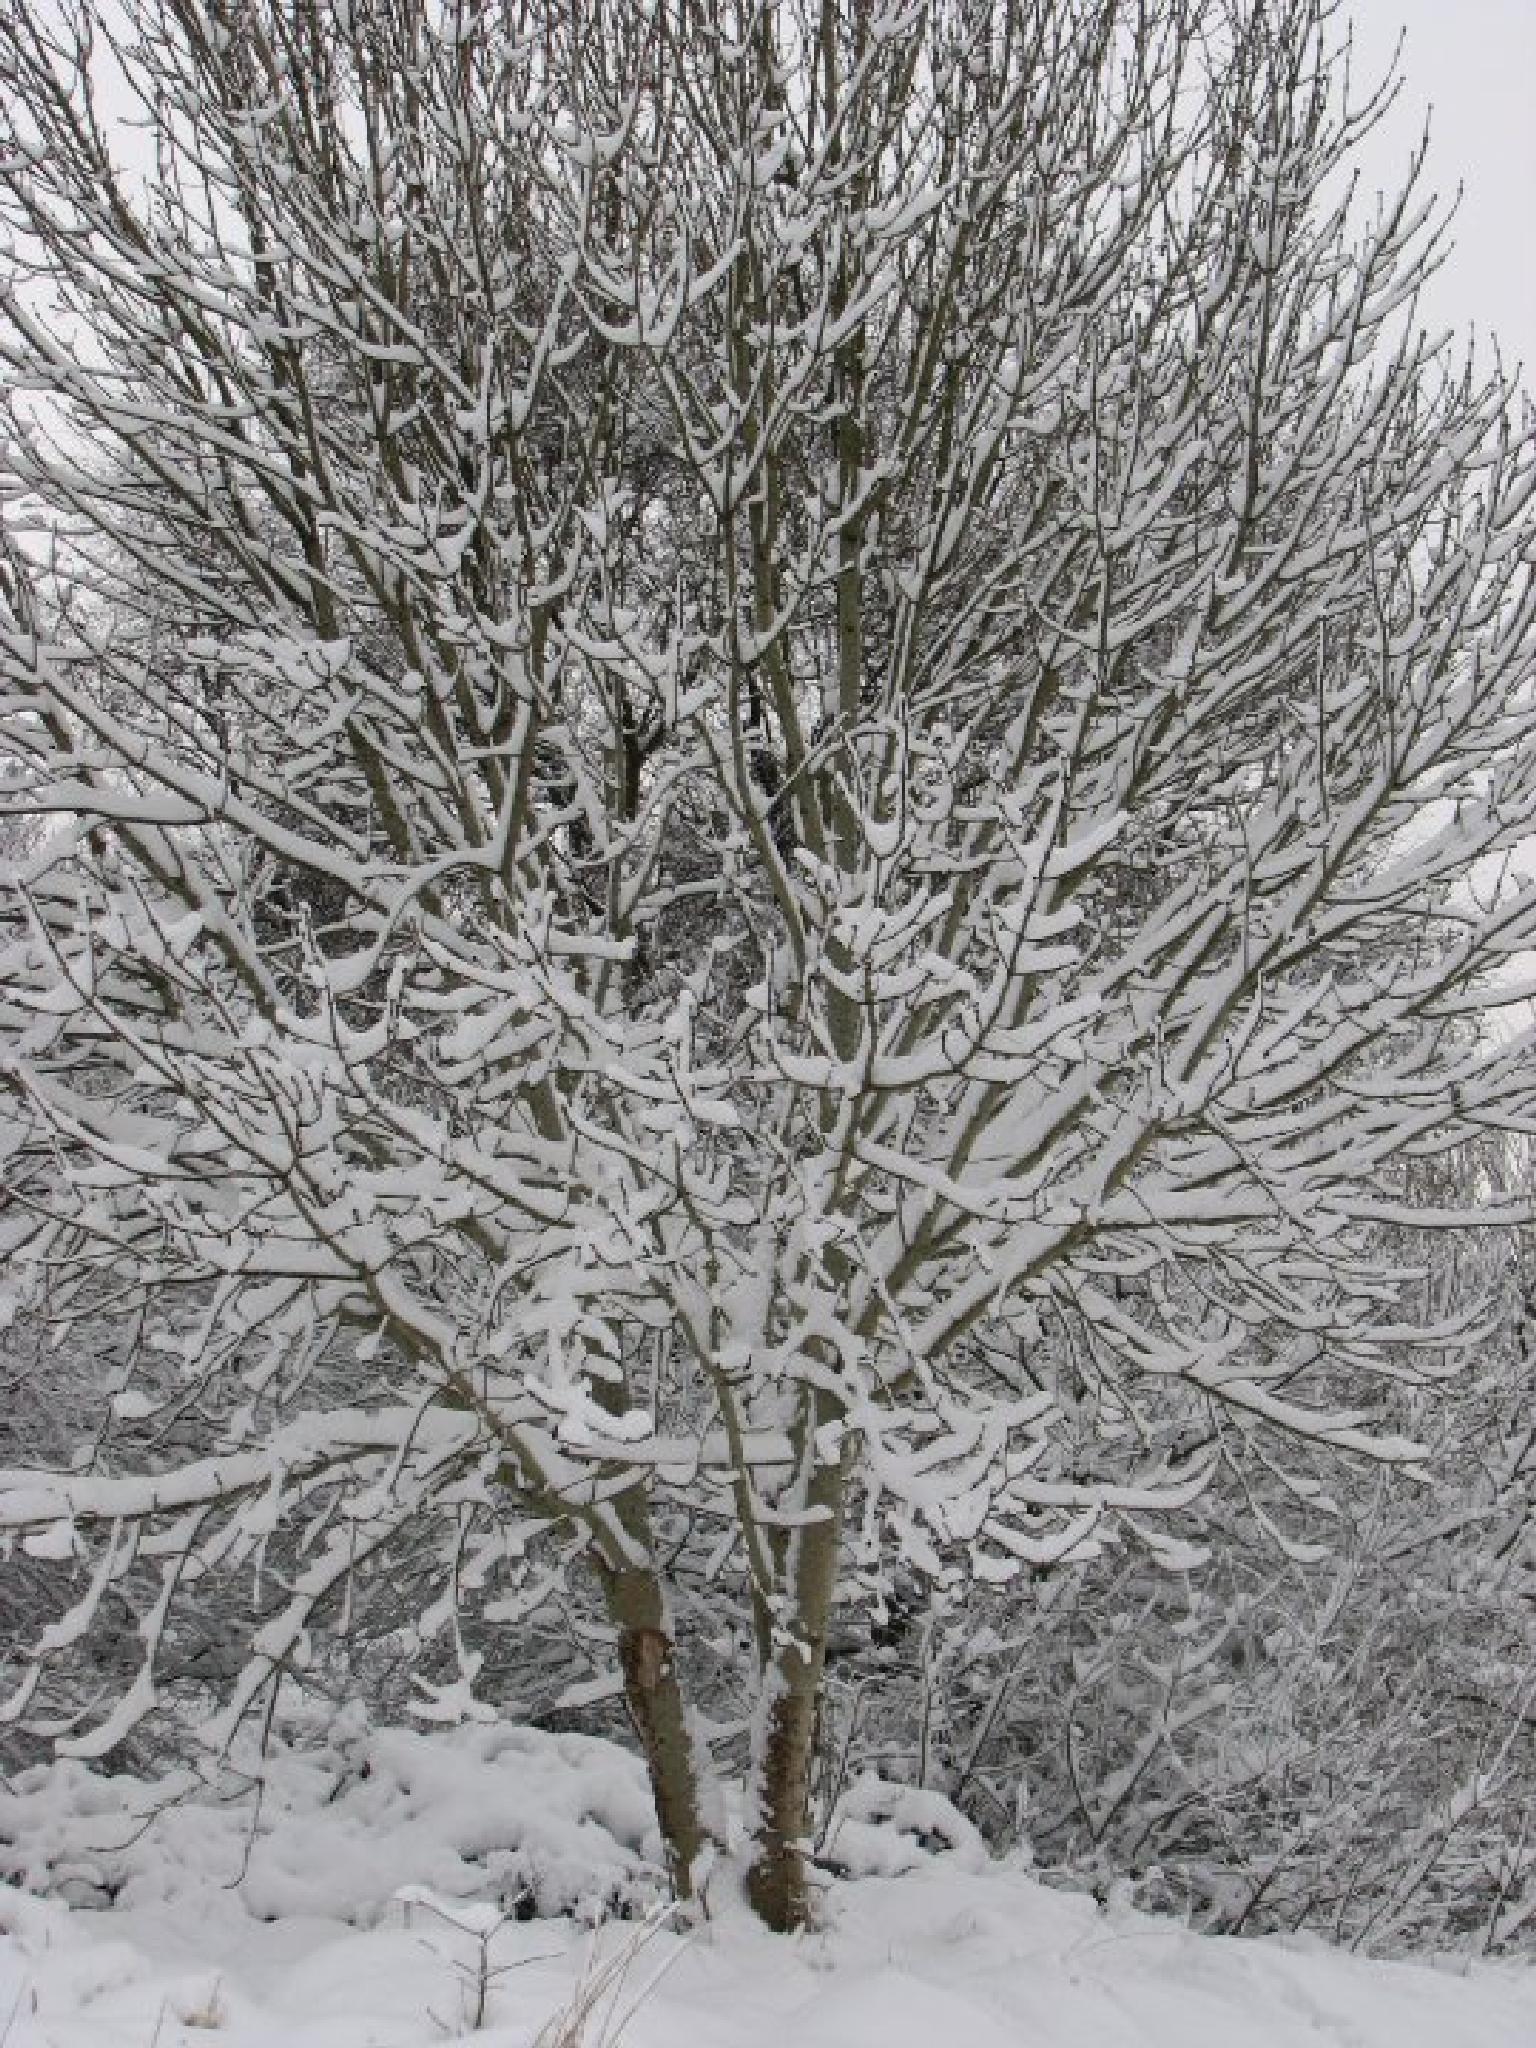 another snowy tree, by nigel.seldon.1